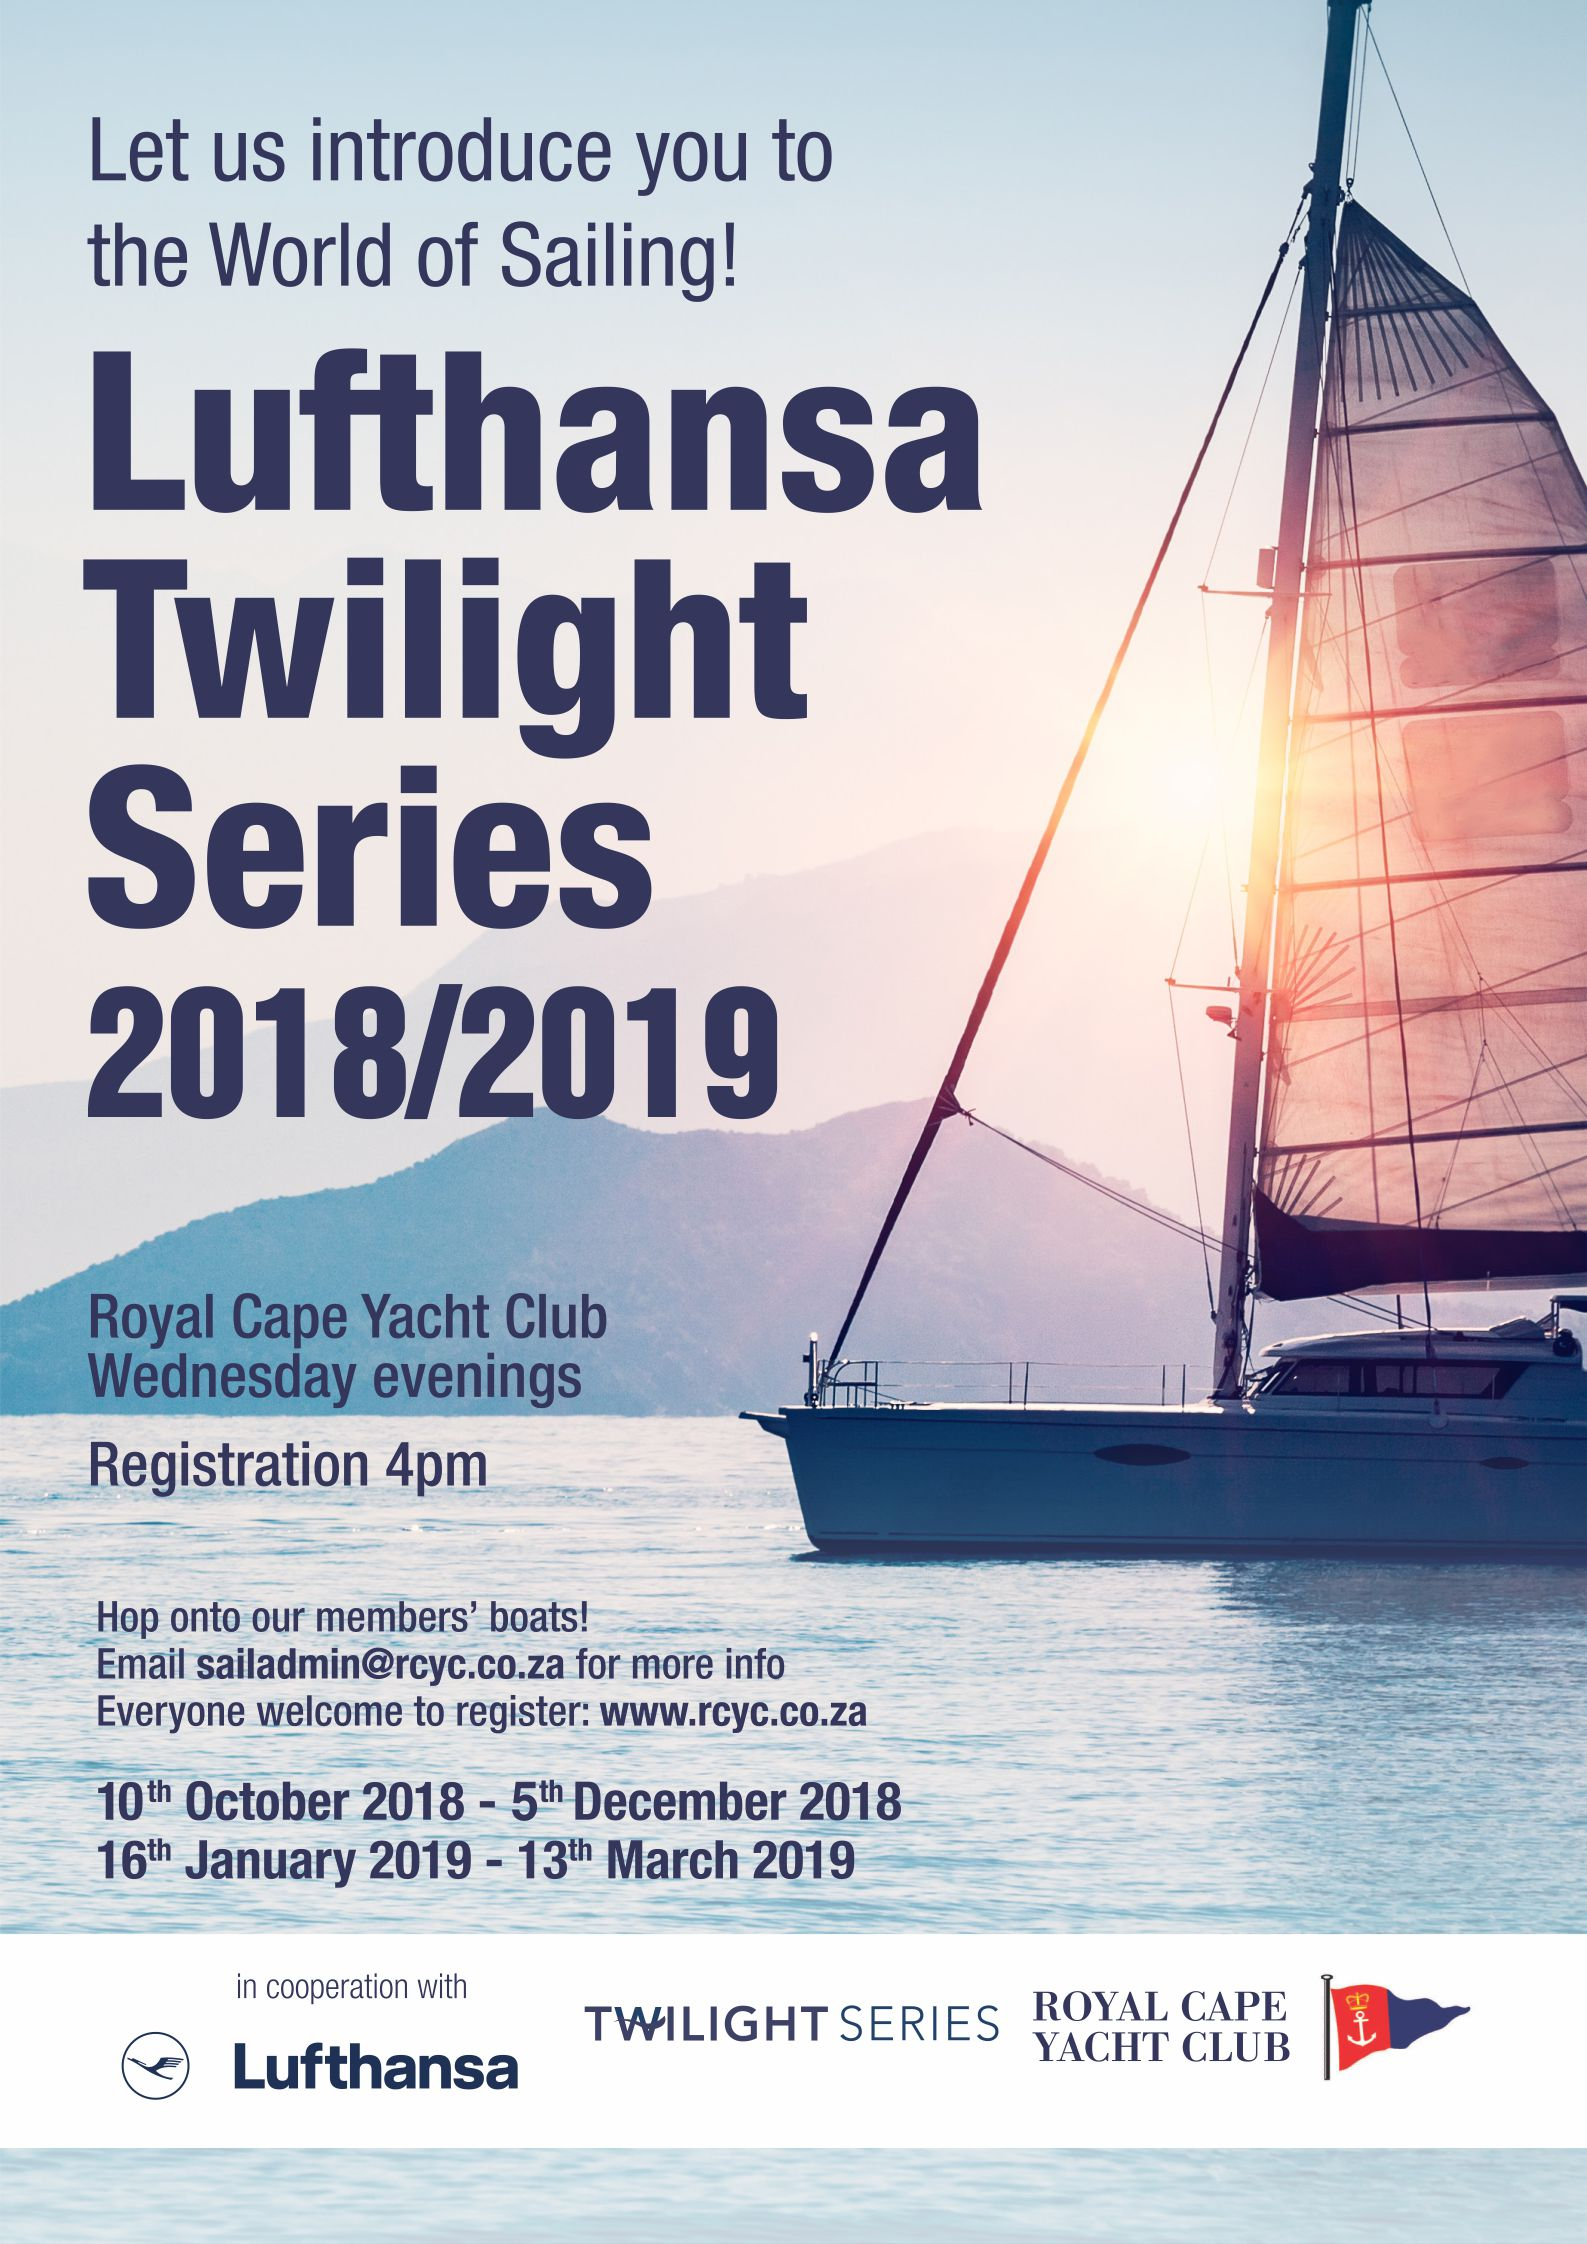 Lufthansa Twilight